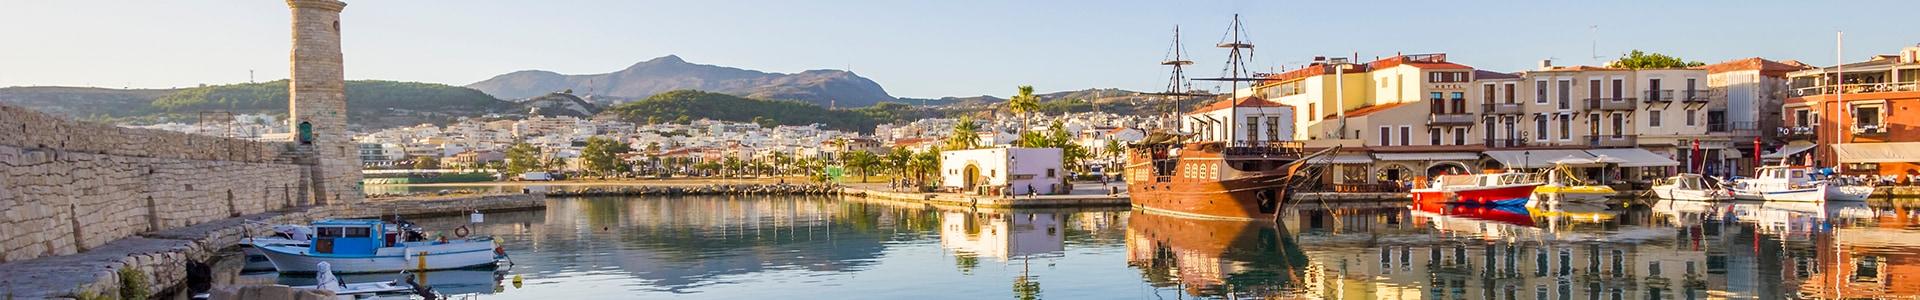 Voyage à Rethymnon